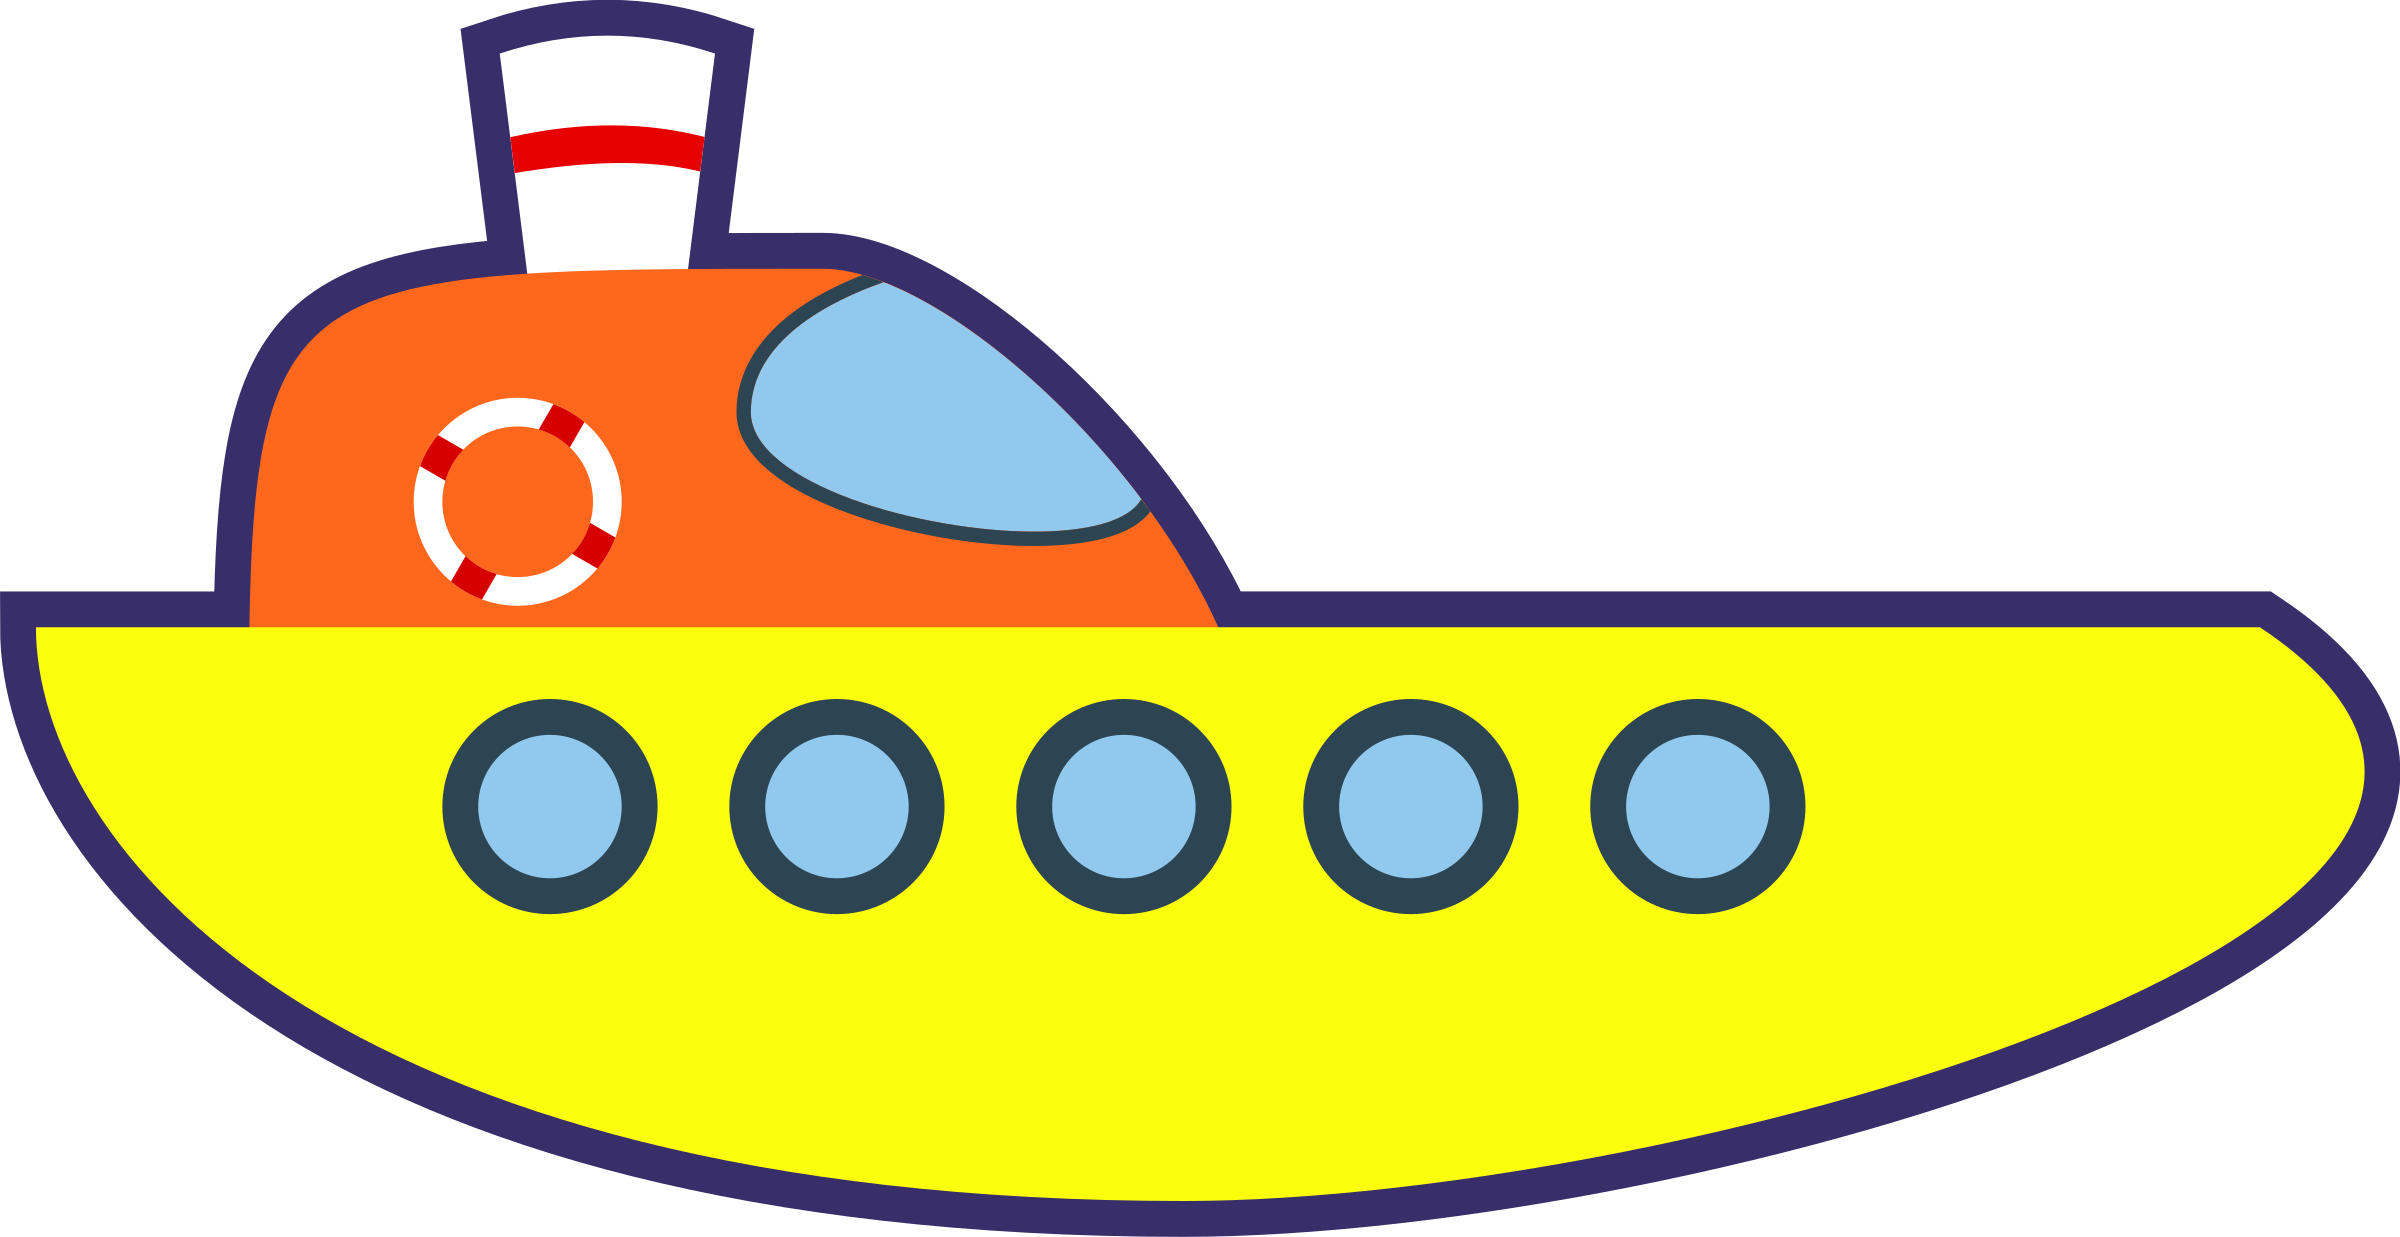 Yellow clipart ship Ship Clipart Cartoon Ship Yellow